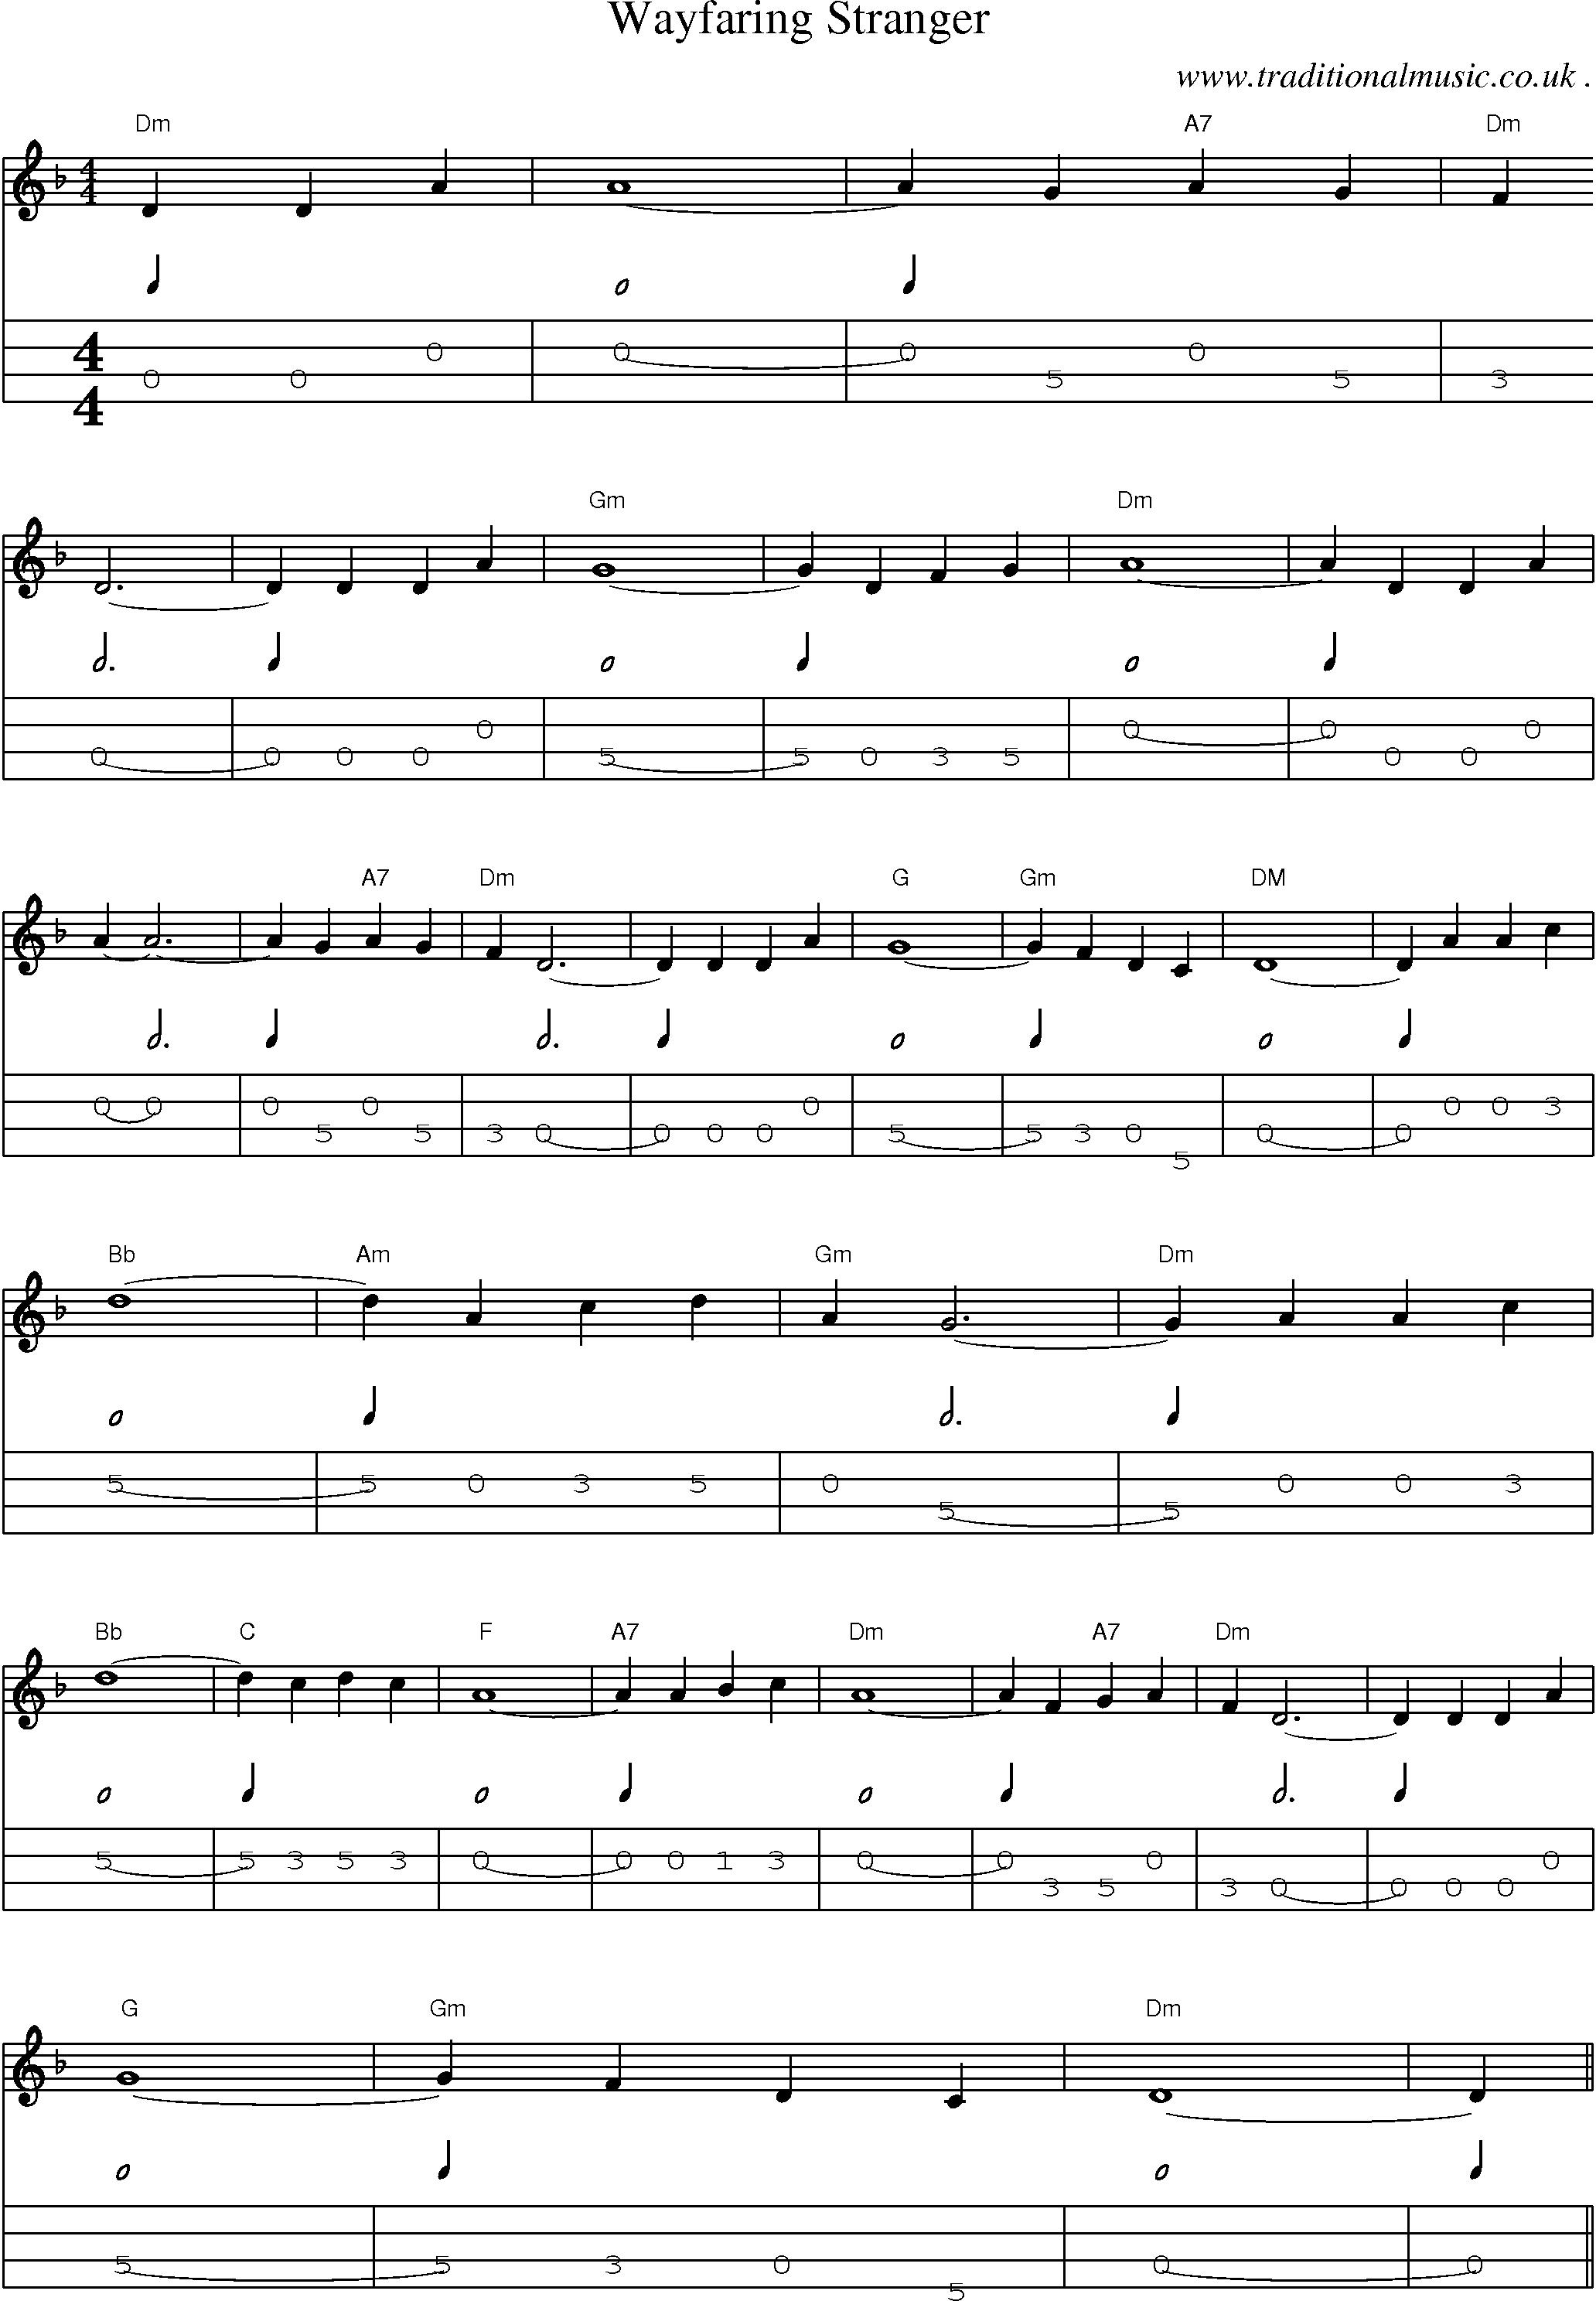 Music Score And Guitar Tabs For Wayfaring Stranger Tabs